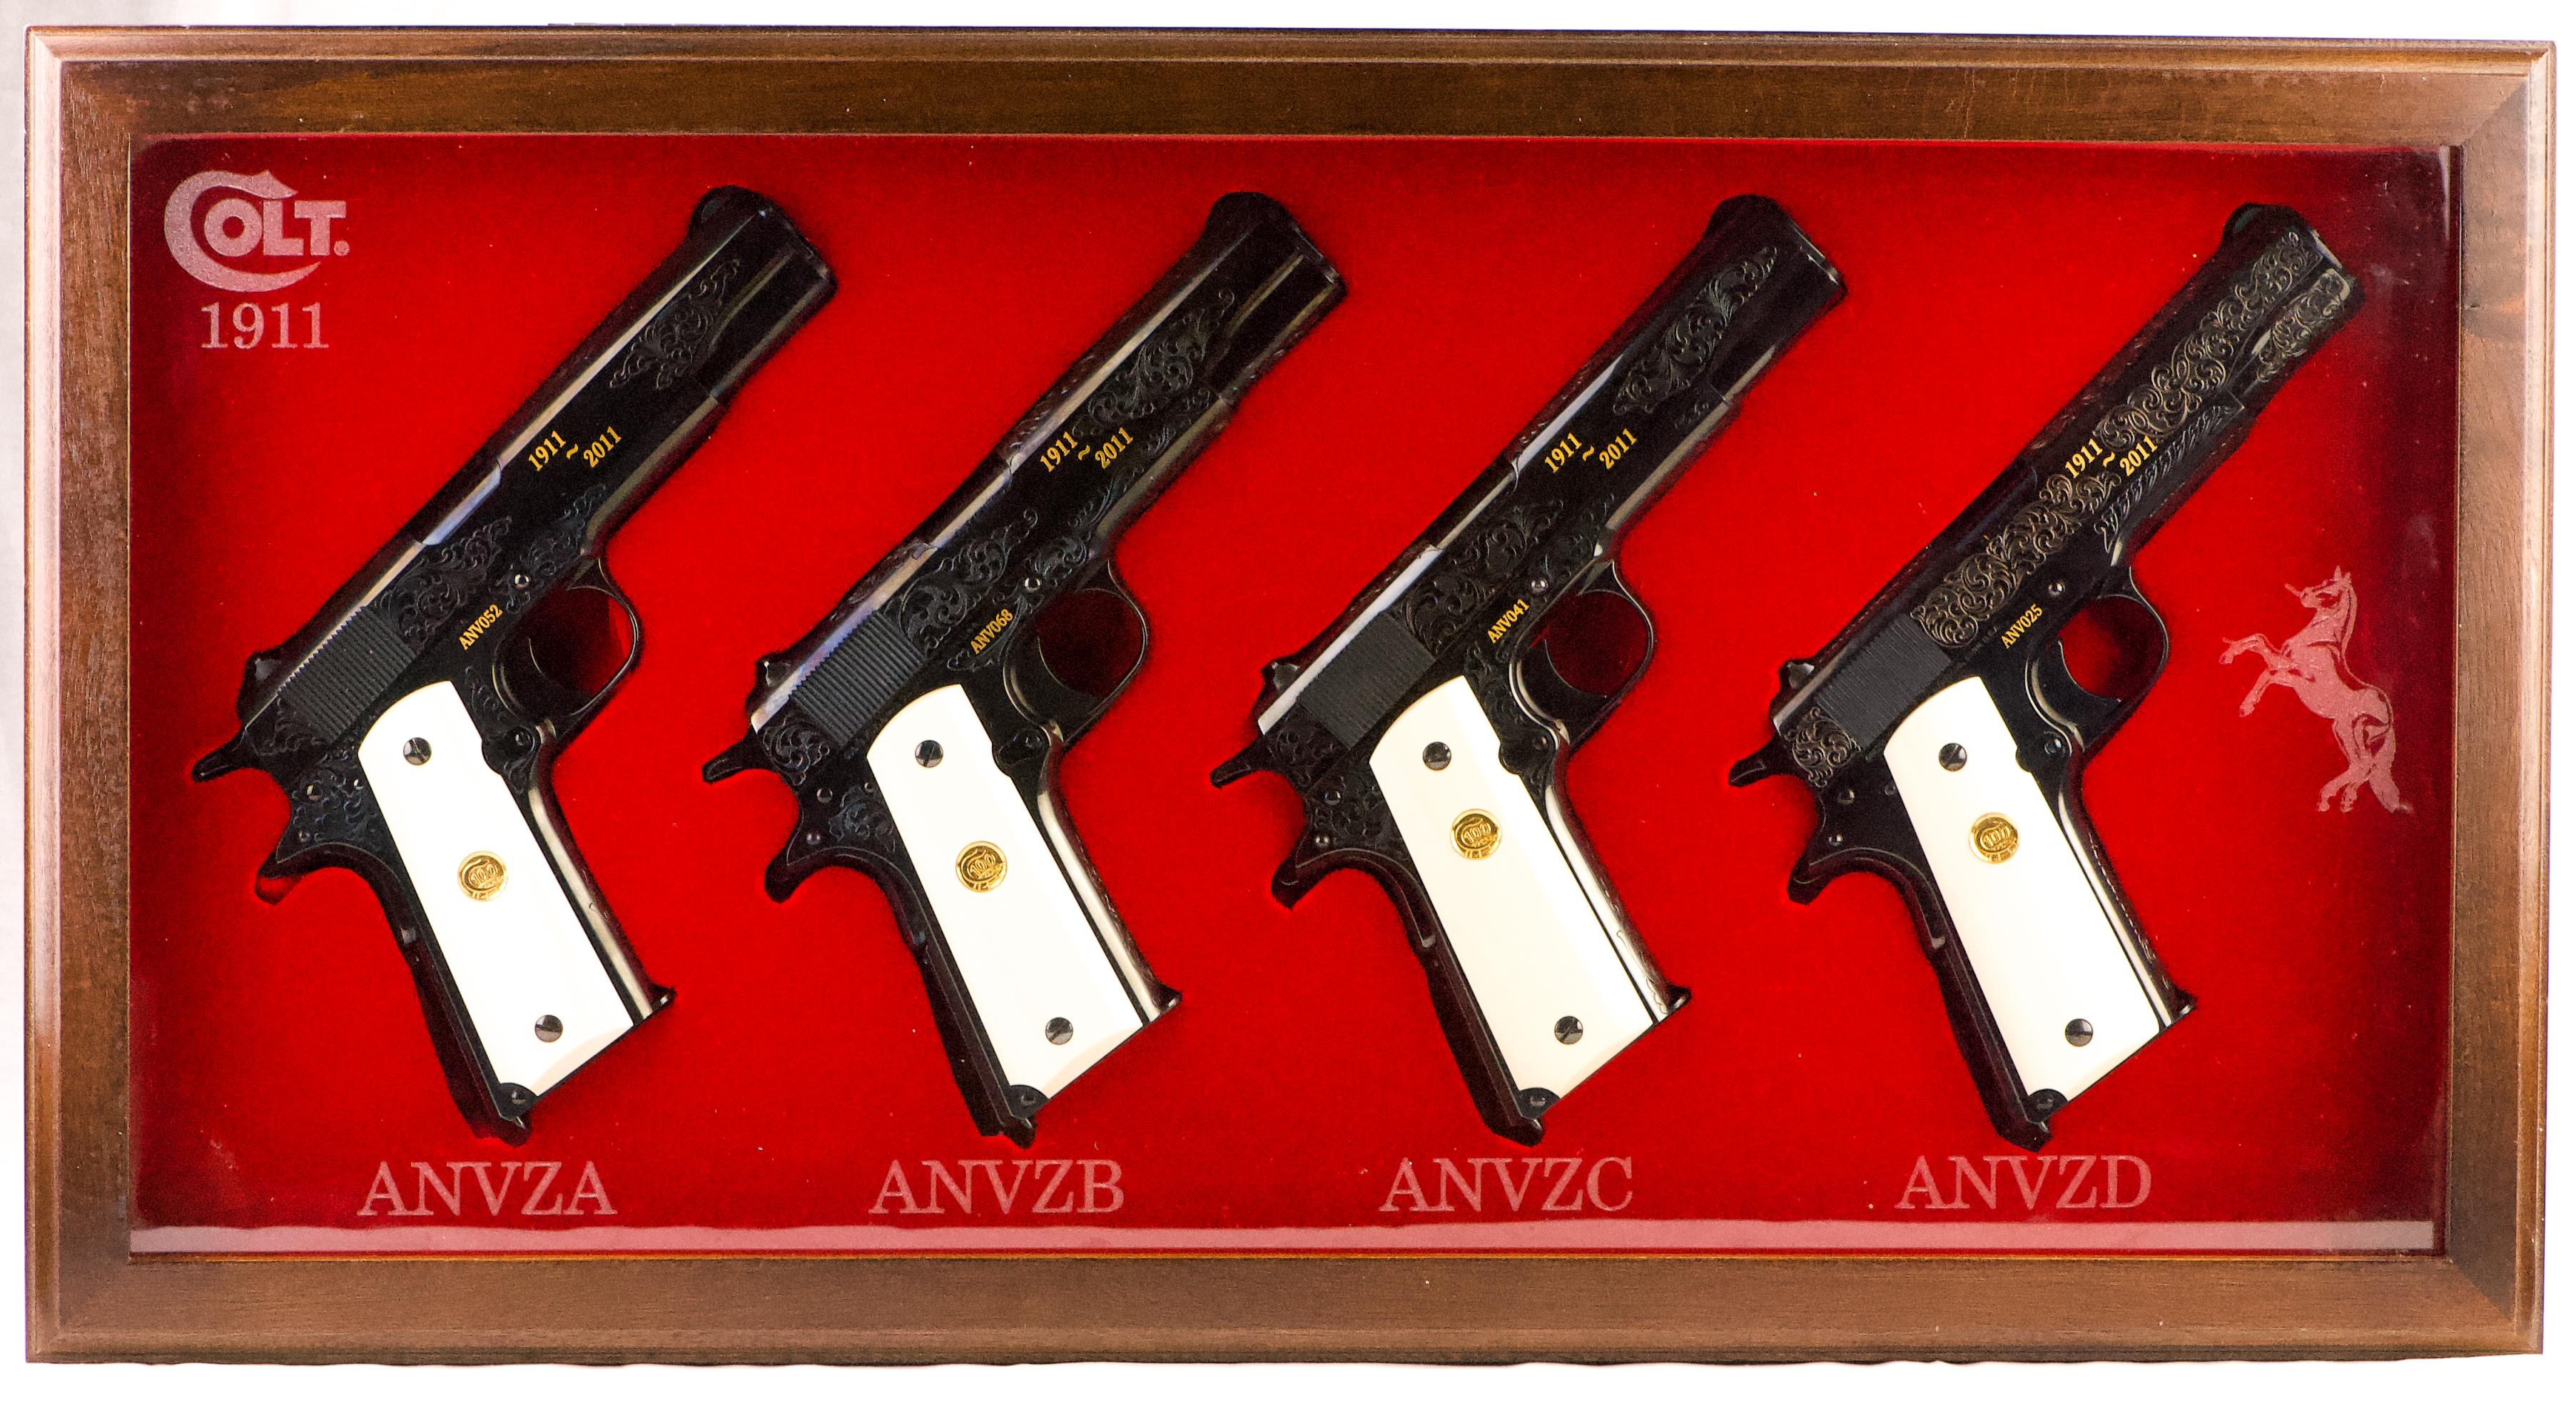 COLT 1911 100TH ANNIVERSARY 4 GUN SET